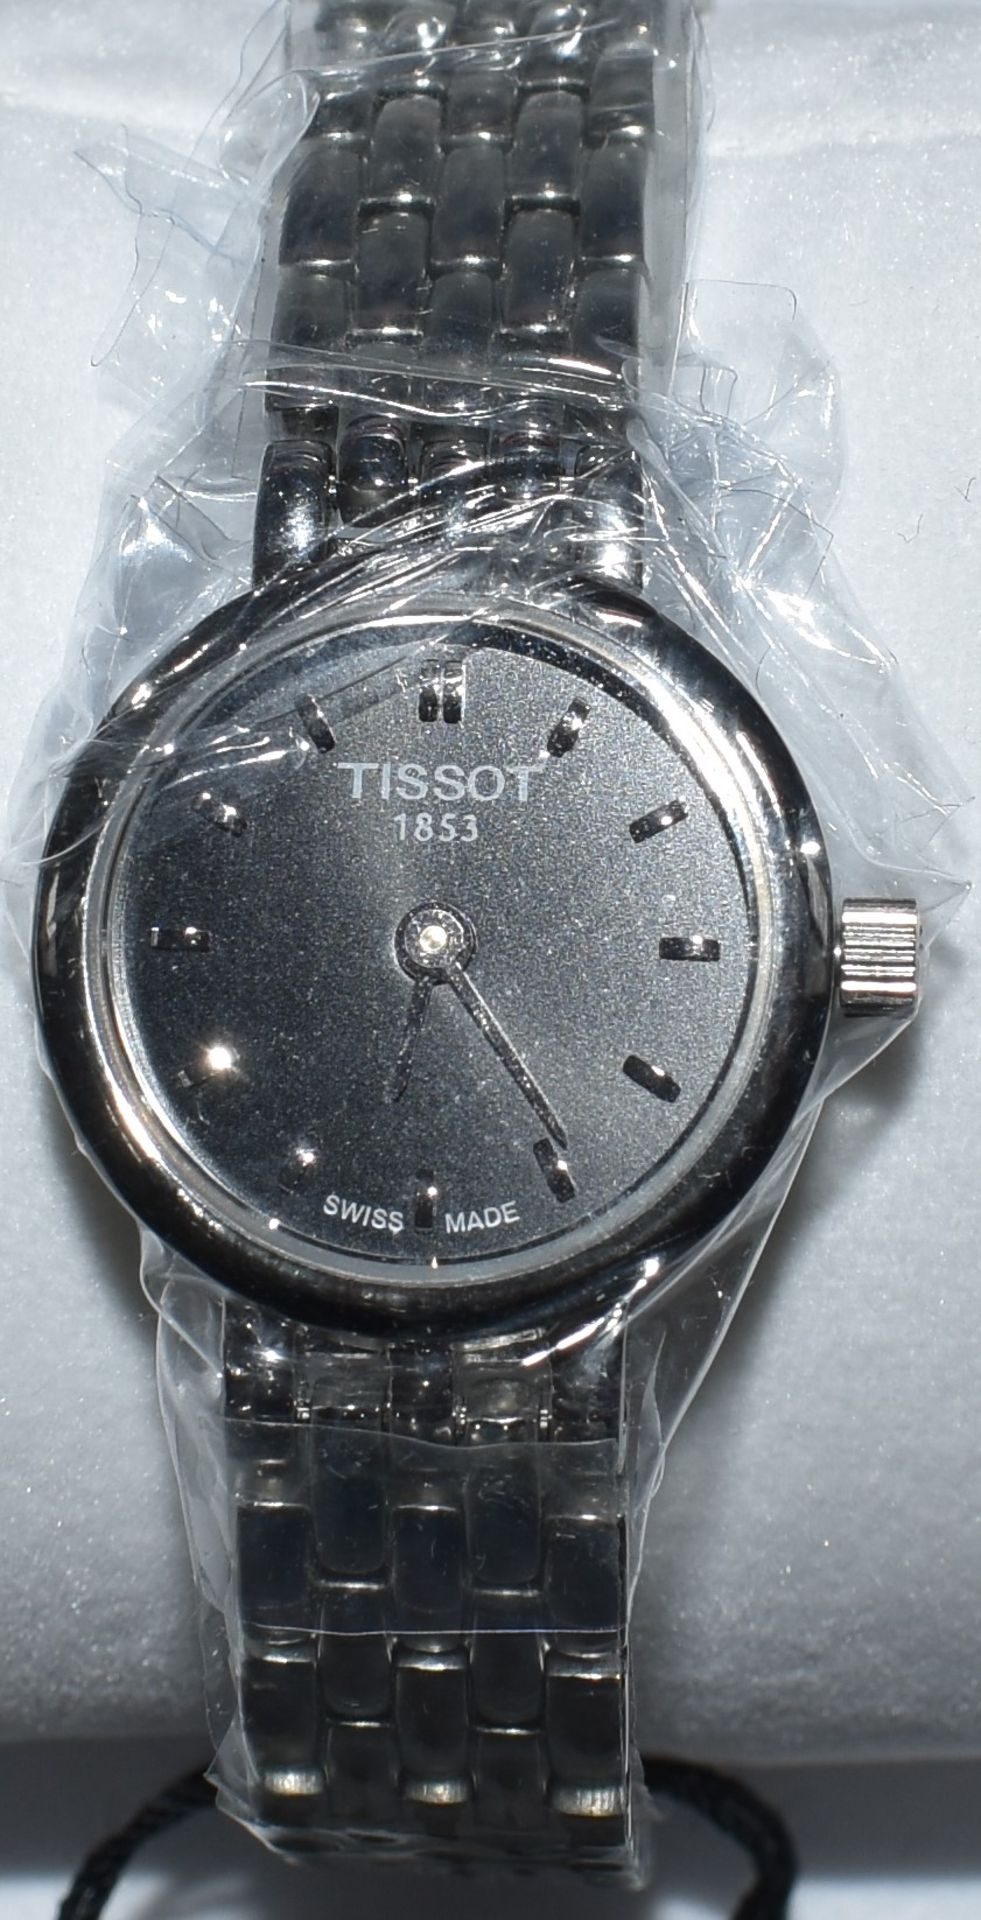 Tissot Ladies Watch TO58.009.11.051.00 - Image 3 of 3